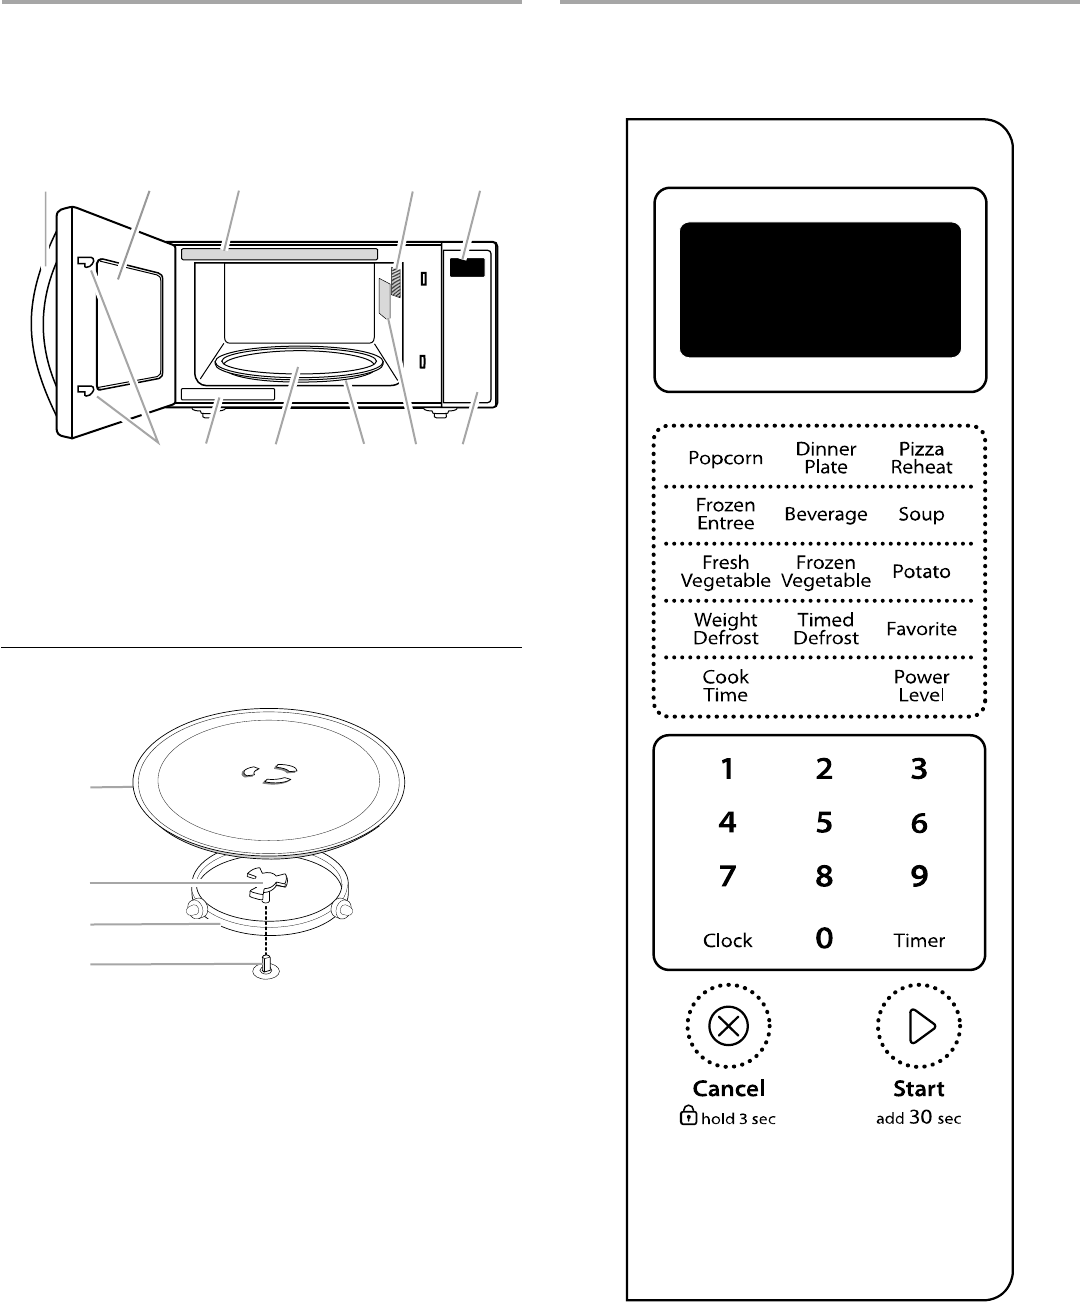 Whirlpool Microwave Oven Wmc50522 Users Manual W10677572A